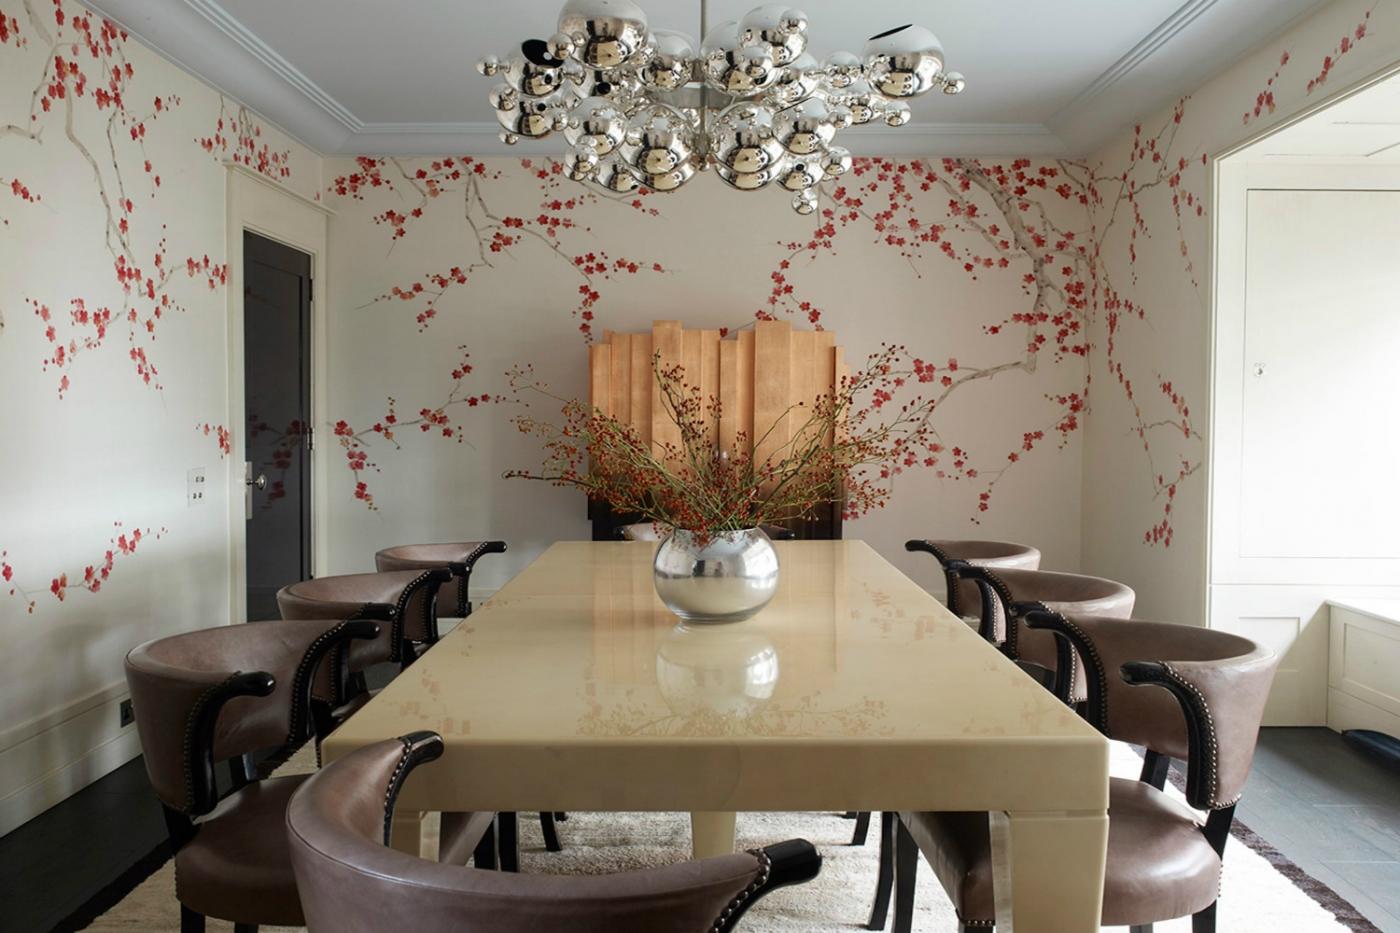 rafael de cárdenas Classic Meets Traditional Residence: A Project By Rafael de Cárdenas featured 5 1400x933